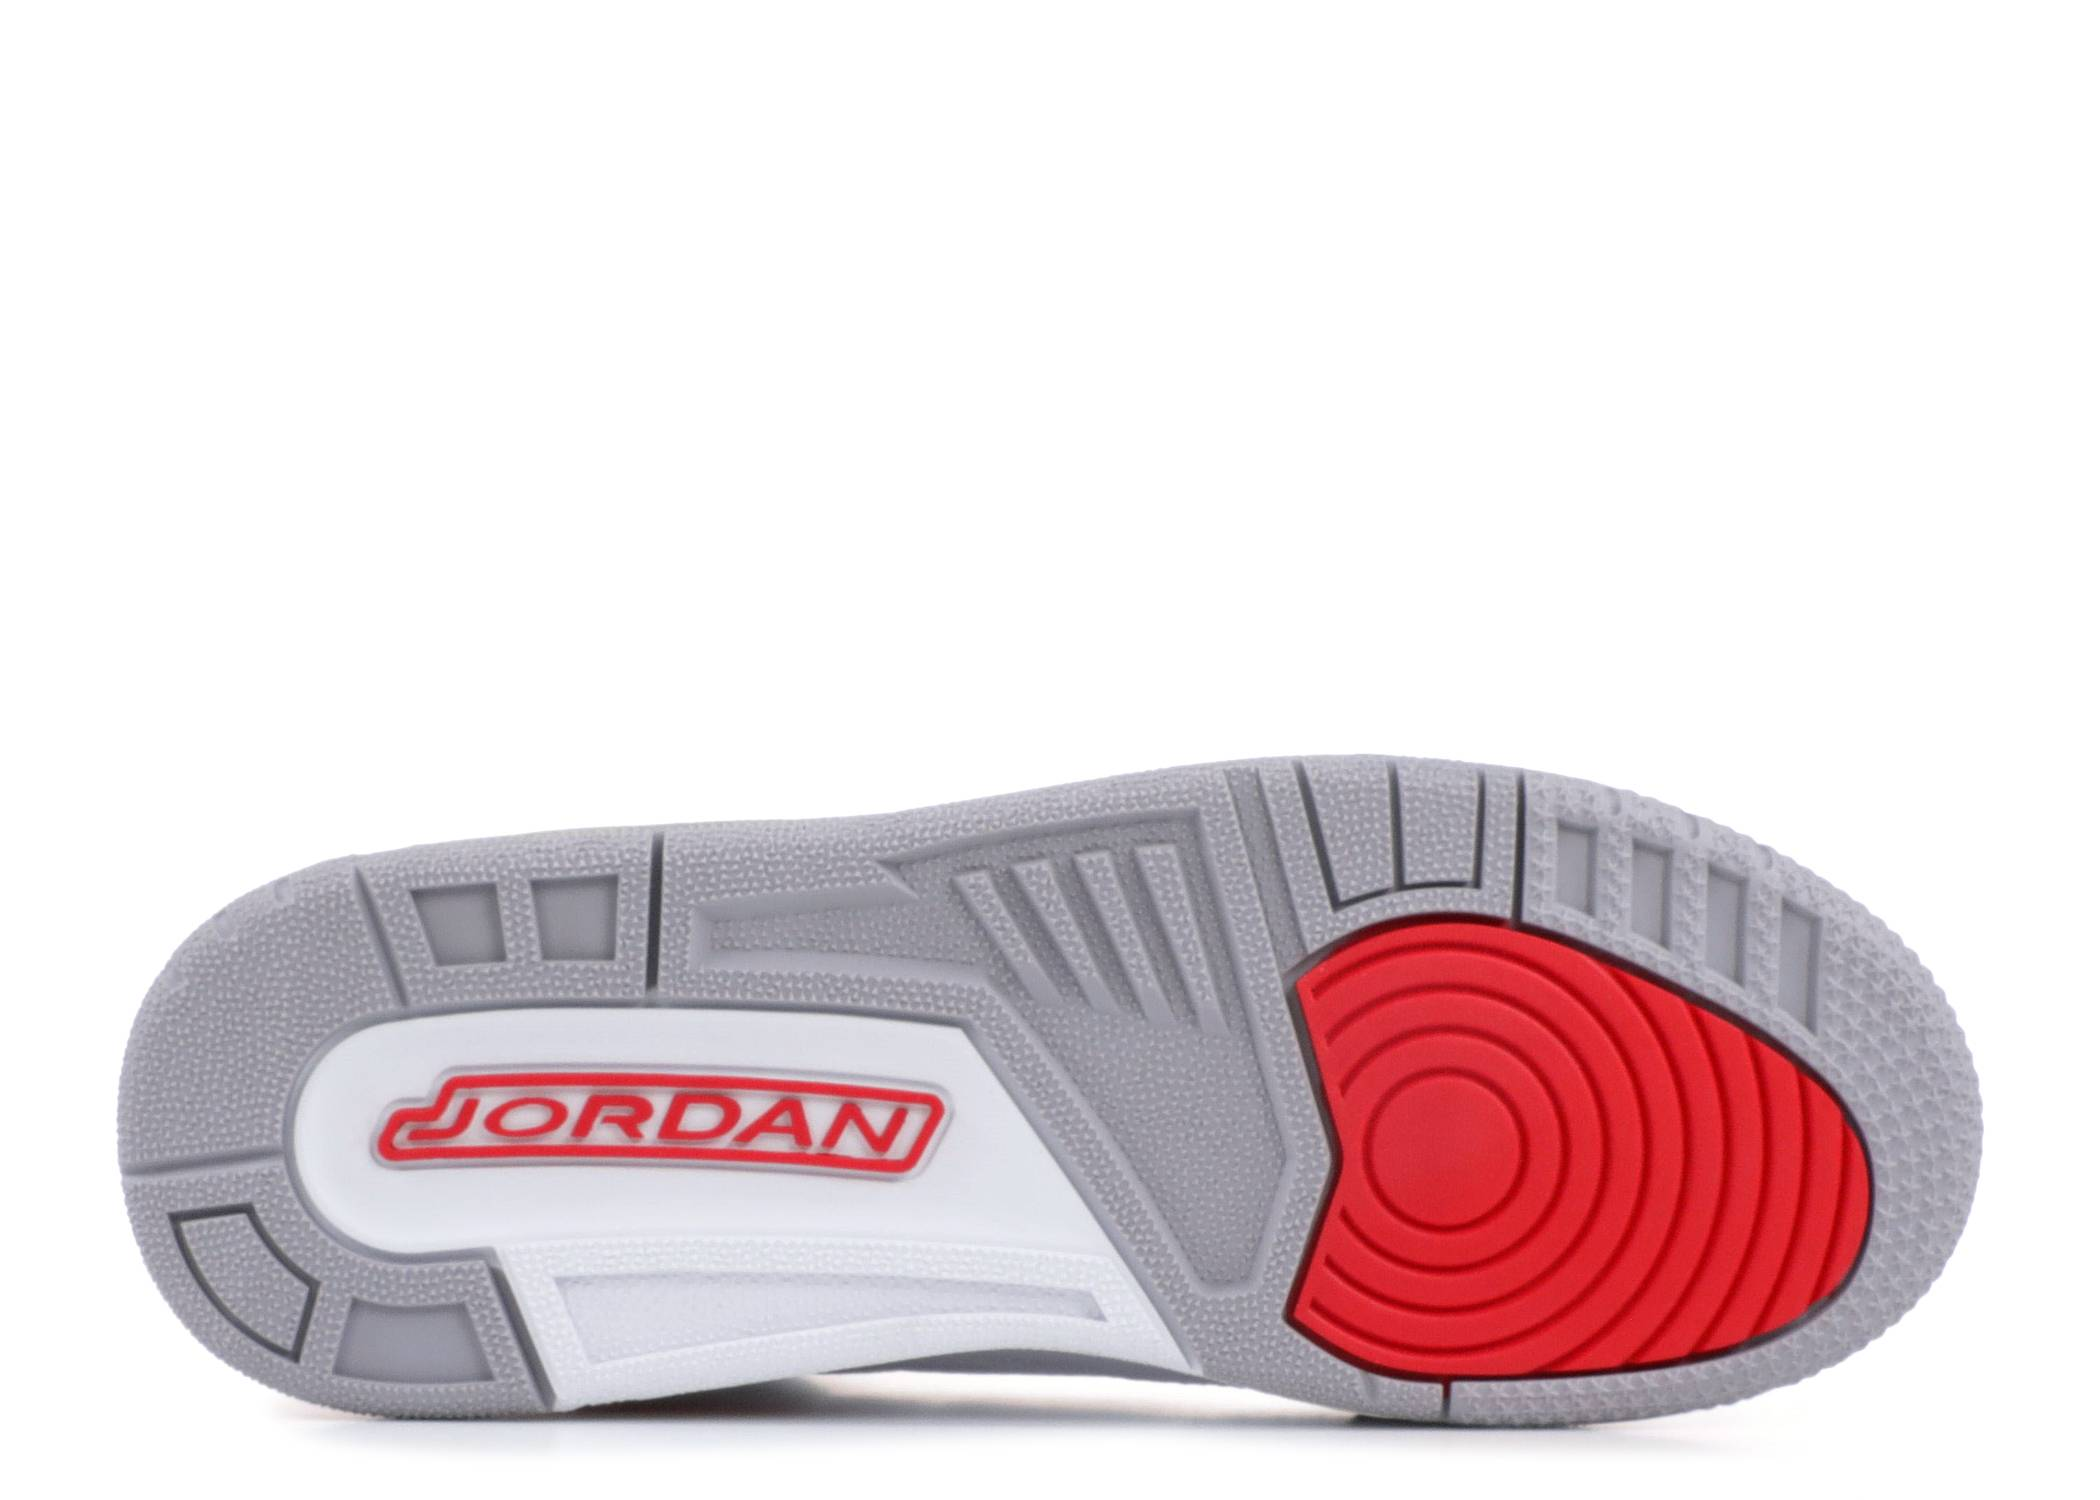 Air Jordan 3 Retro GS 'Hall of Fame'